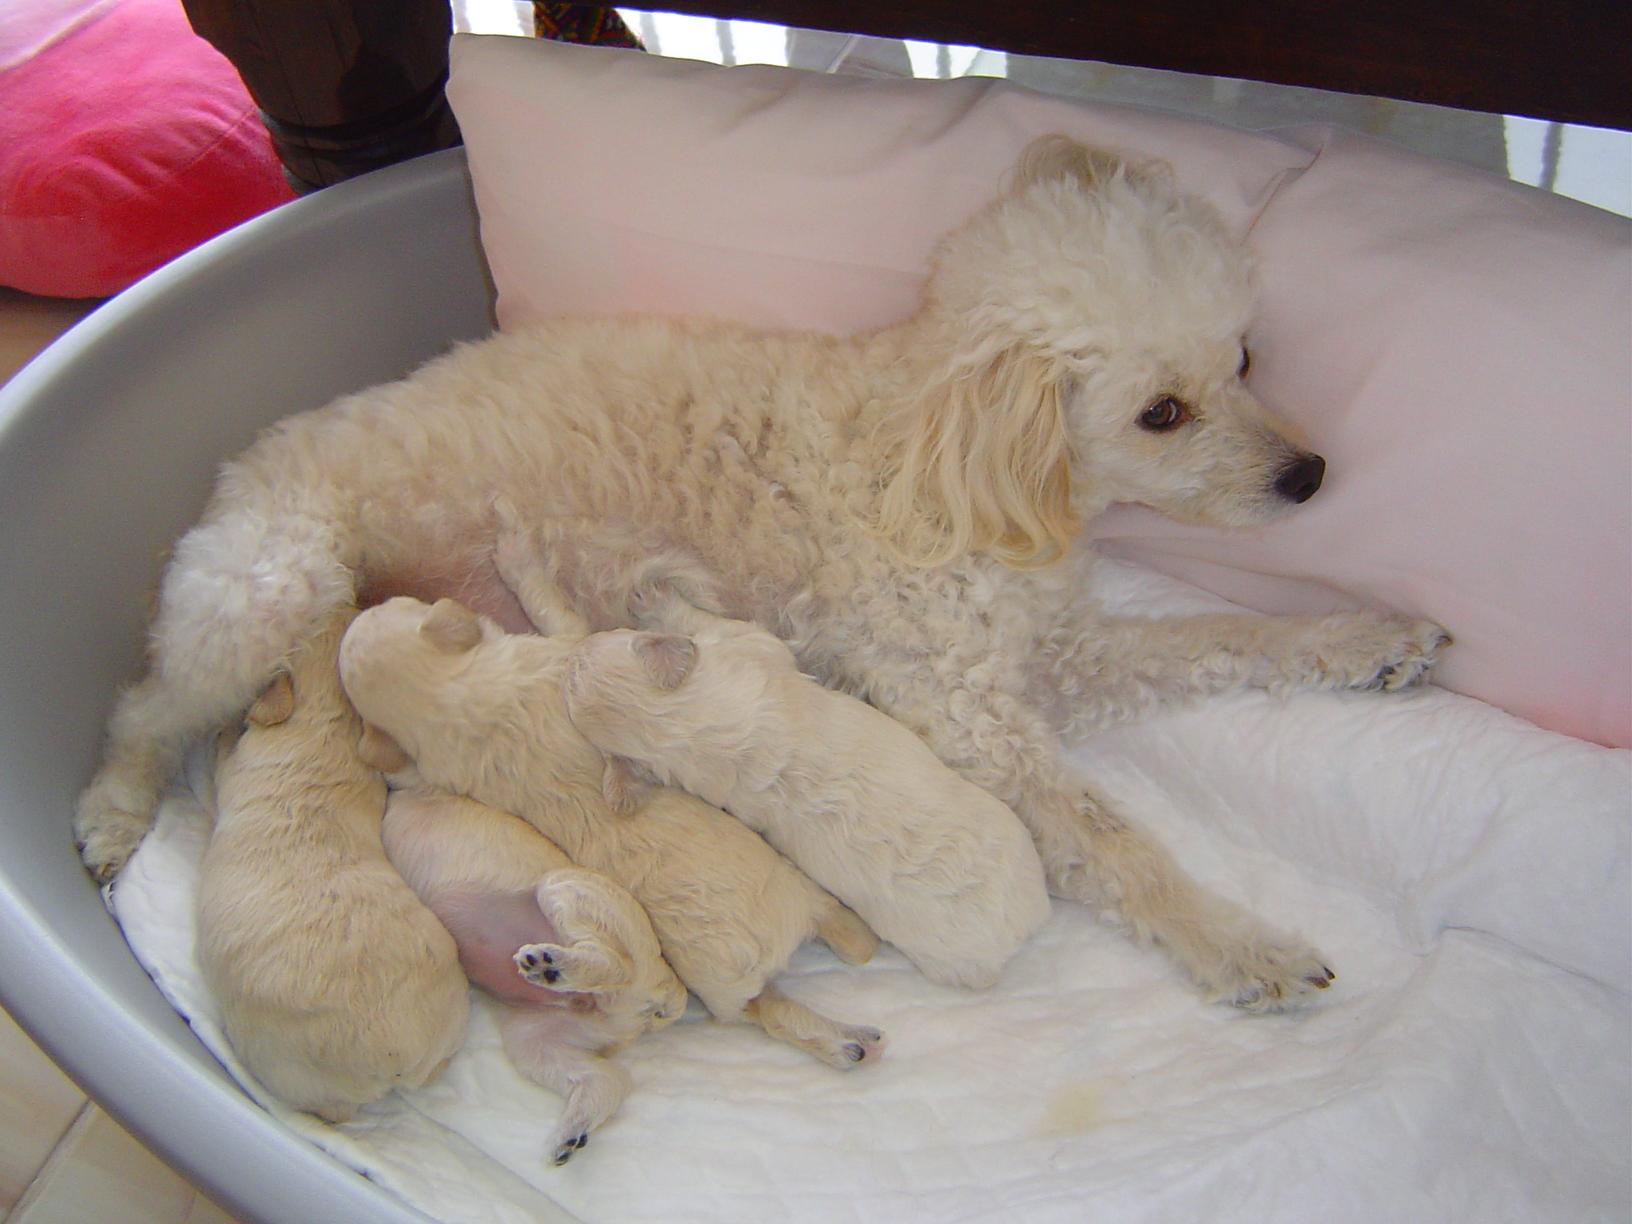 Cachorritos de caniche toy.   El blog de los clientes JG